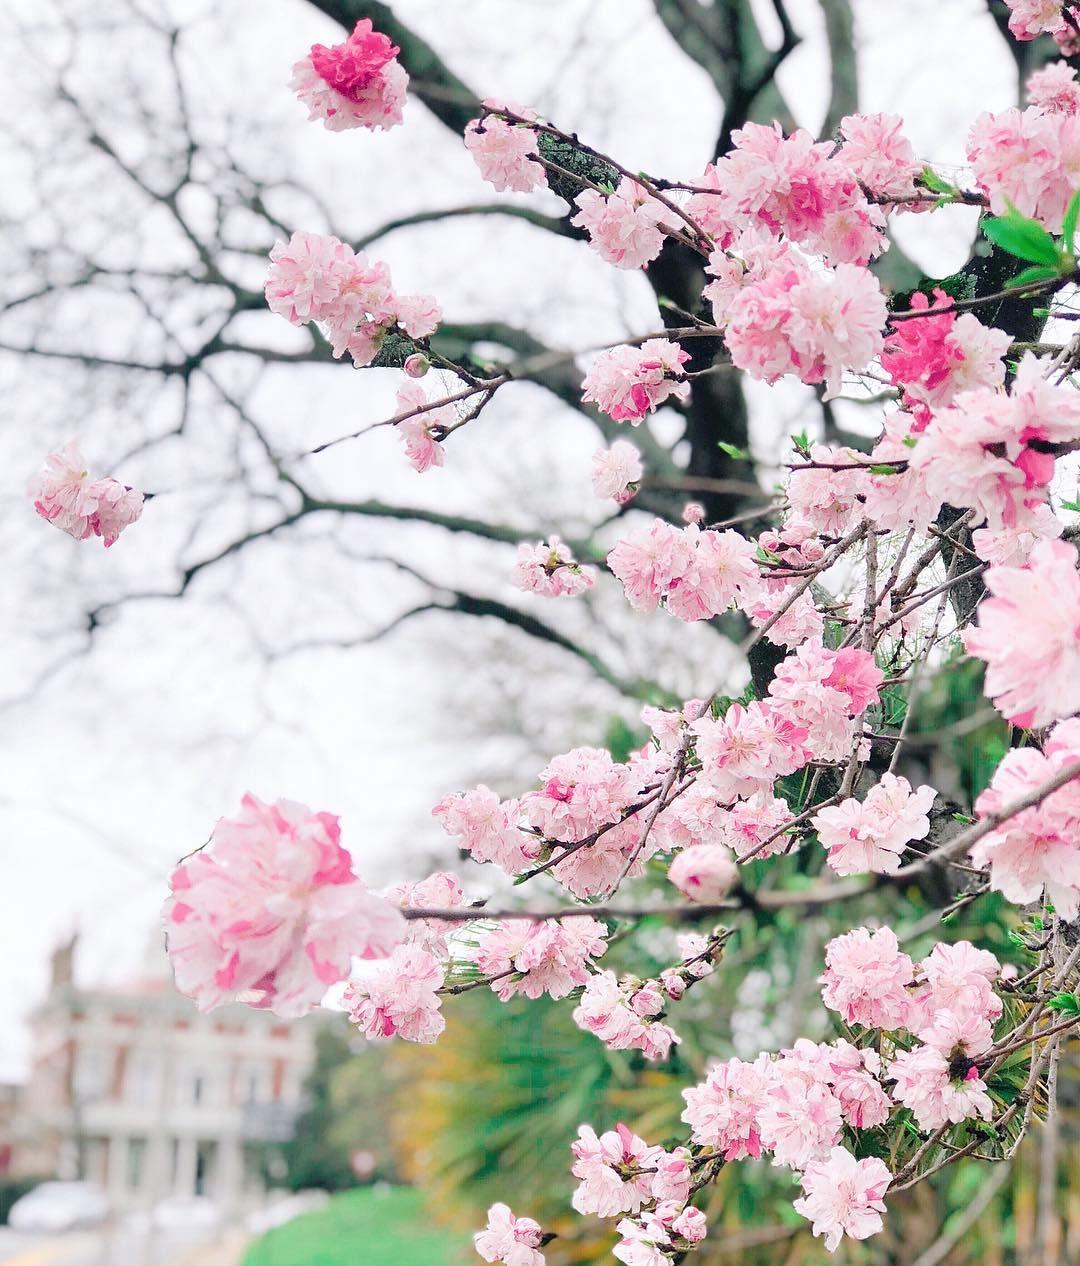 Explore Georgia On Instagram With Over 350 000 Yoshino Cherry Trees Visitmacon Becomes The Pinkest City In Th Yoshino Cherry Tree Yoshino Cherry Pink Trees